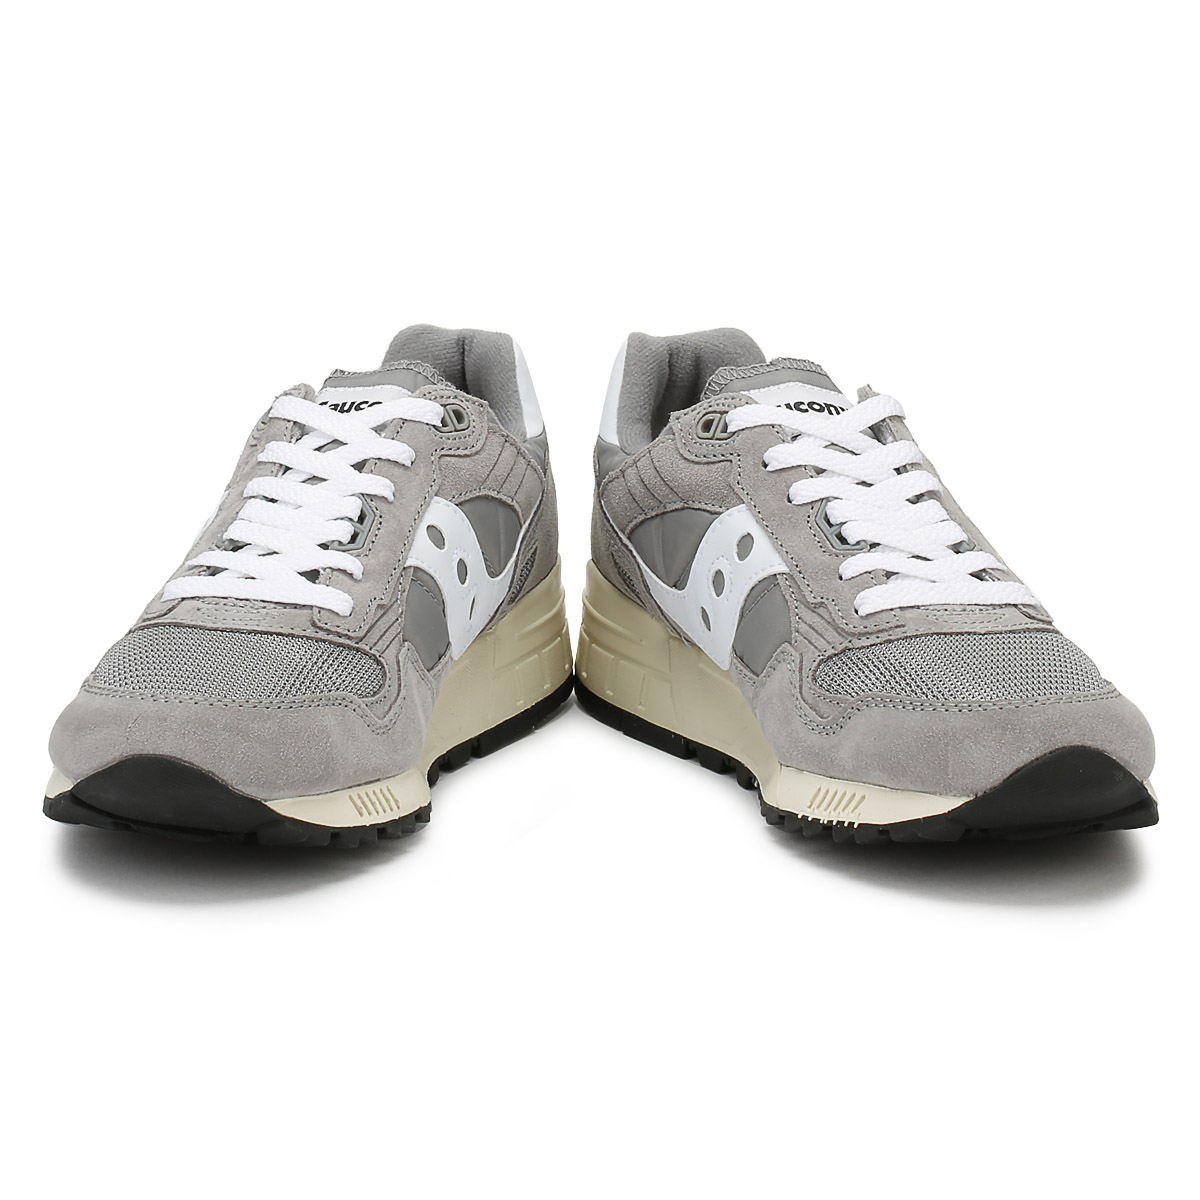 Saucony   Herren Trainers Grau Shadow 5000 Vintage Vintage Vintage Sport Casual Schuhes b76743